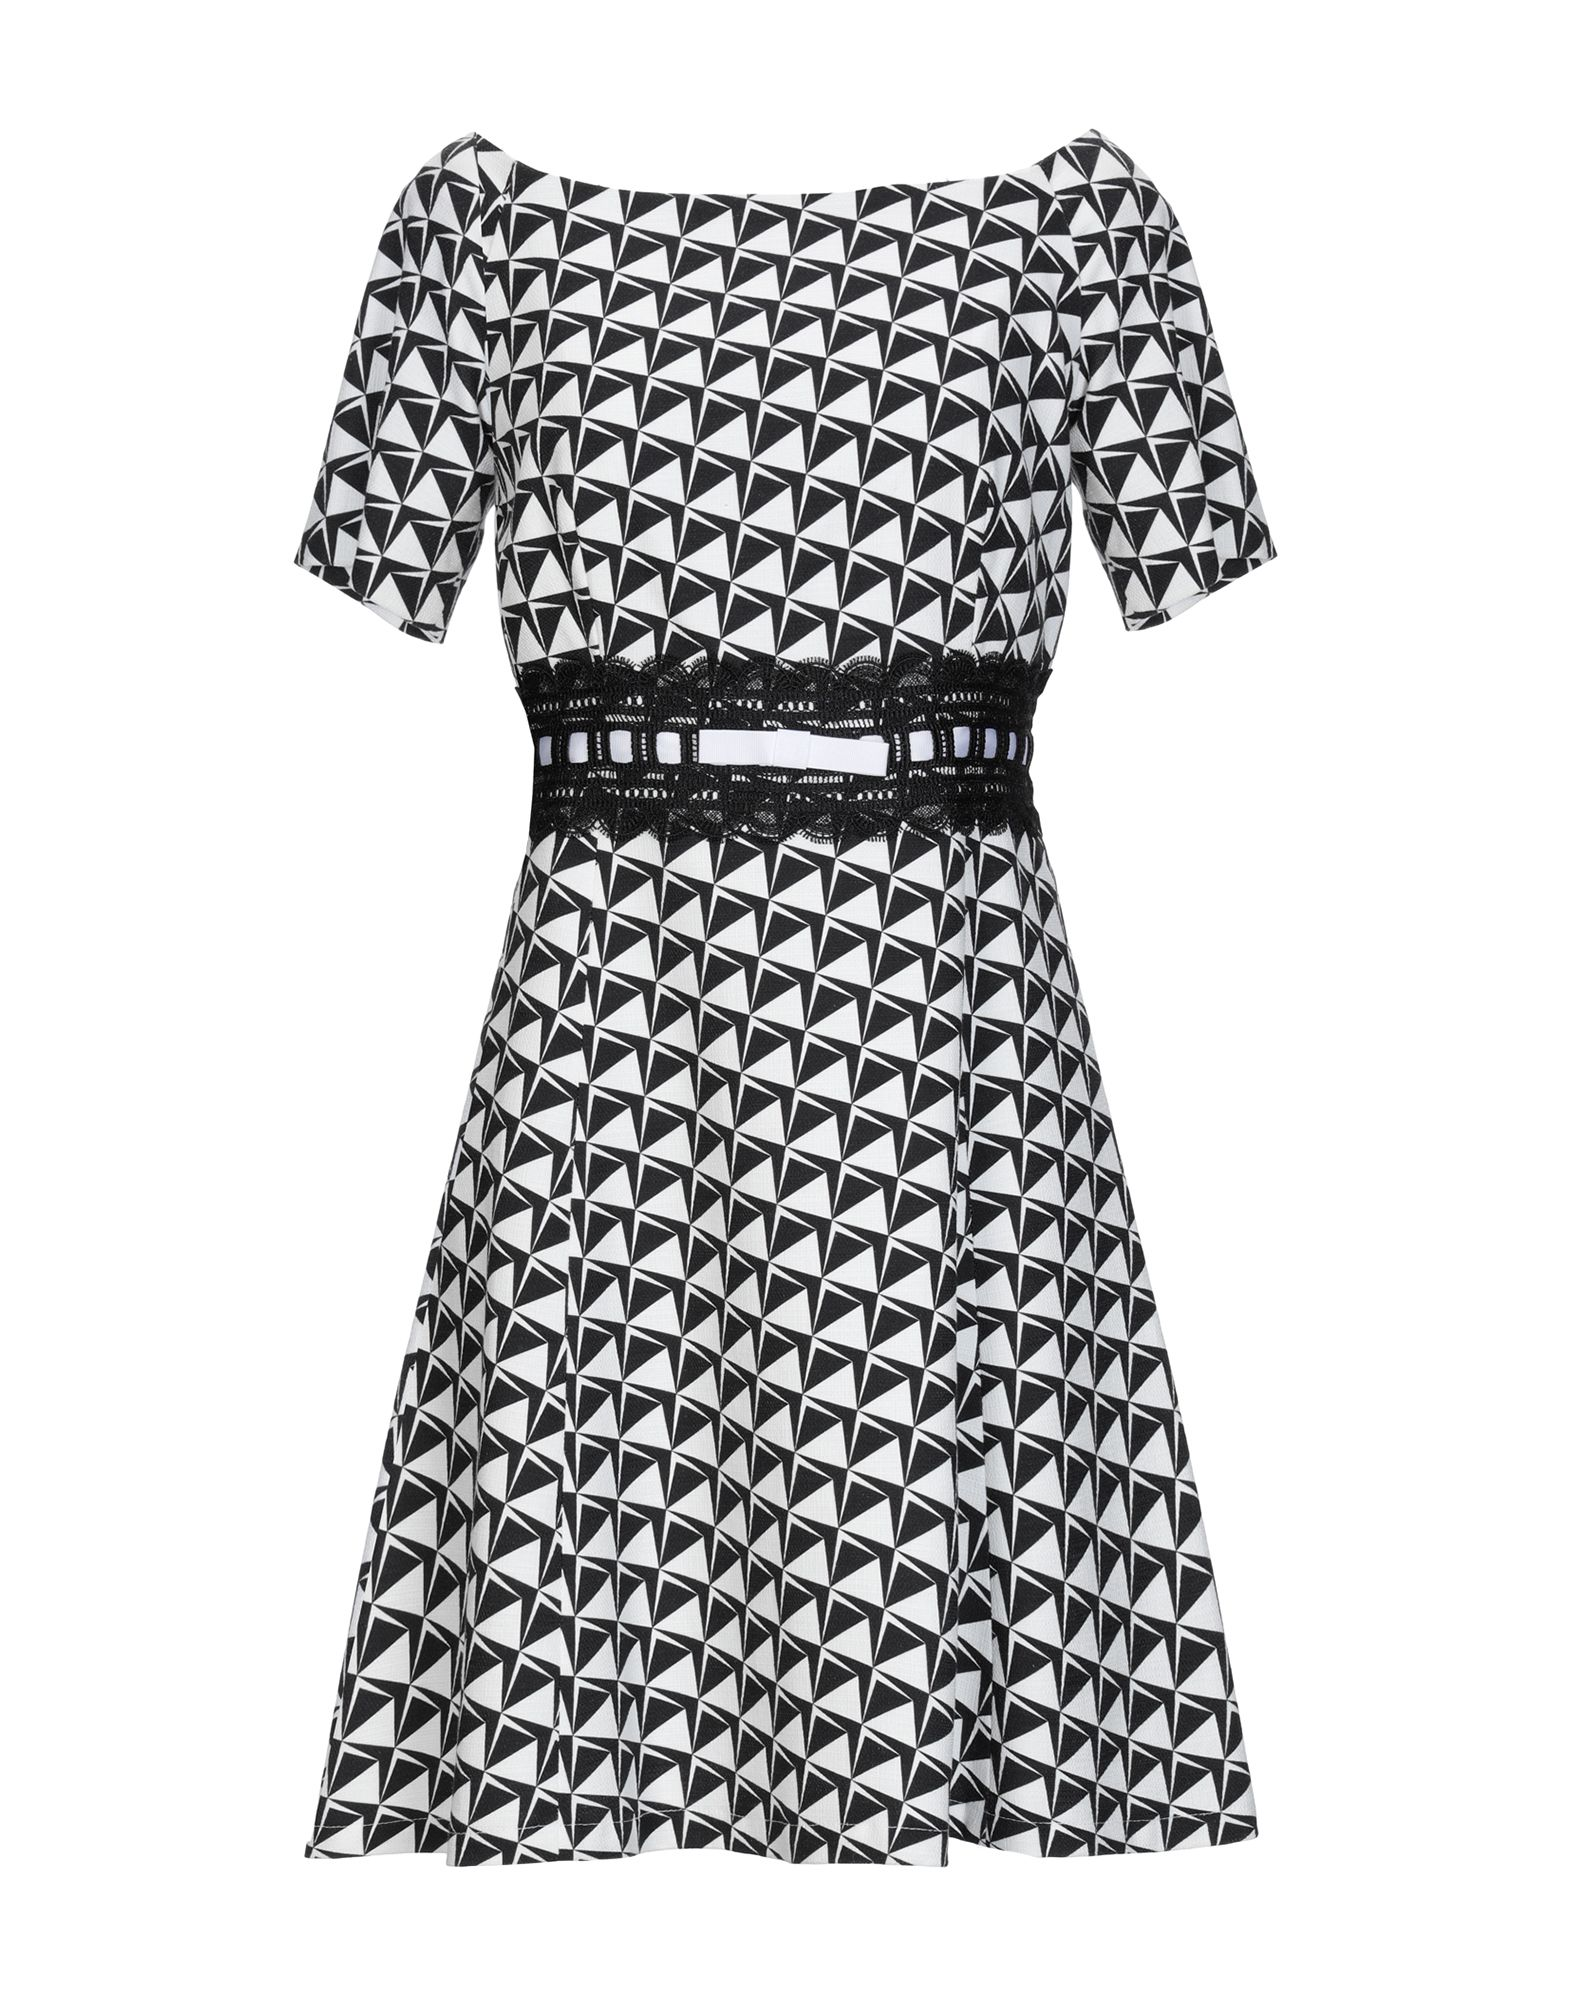 22 MAGGIO by MARIA GRAZIA SEVERI Короткое платье юбка 22 maggio юбки трикотажные